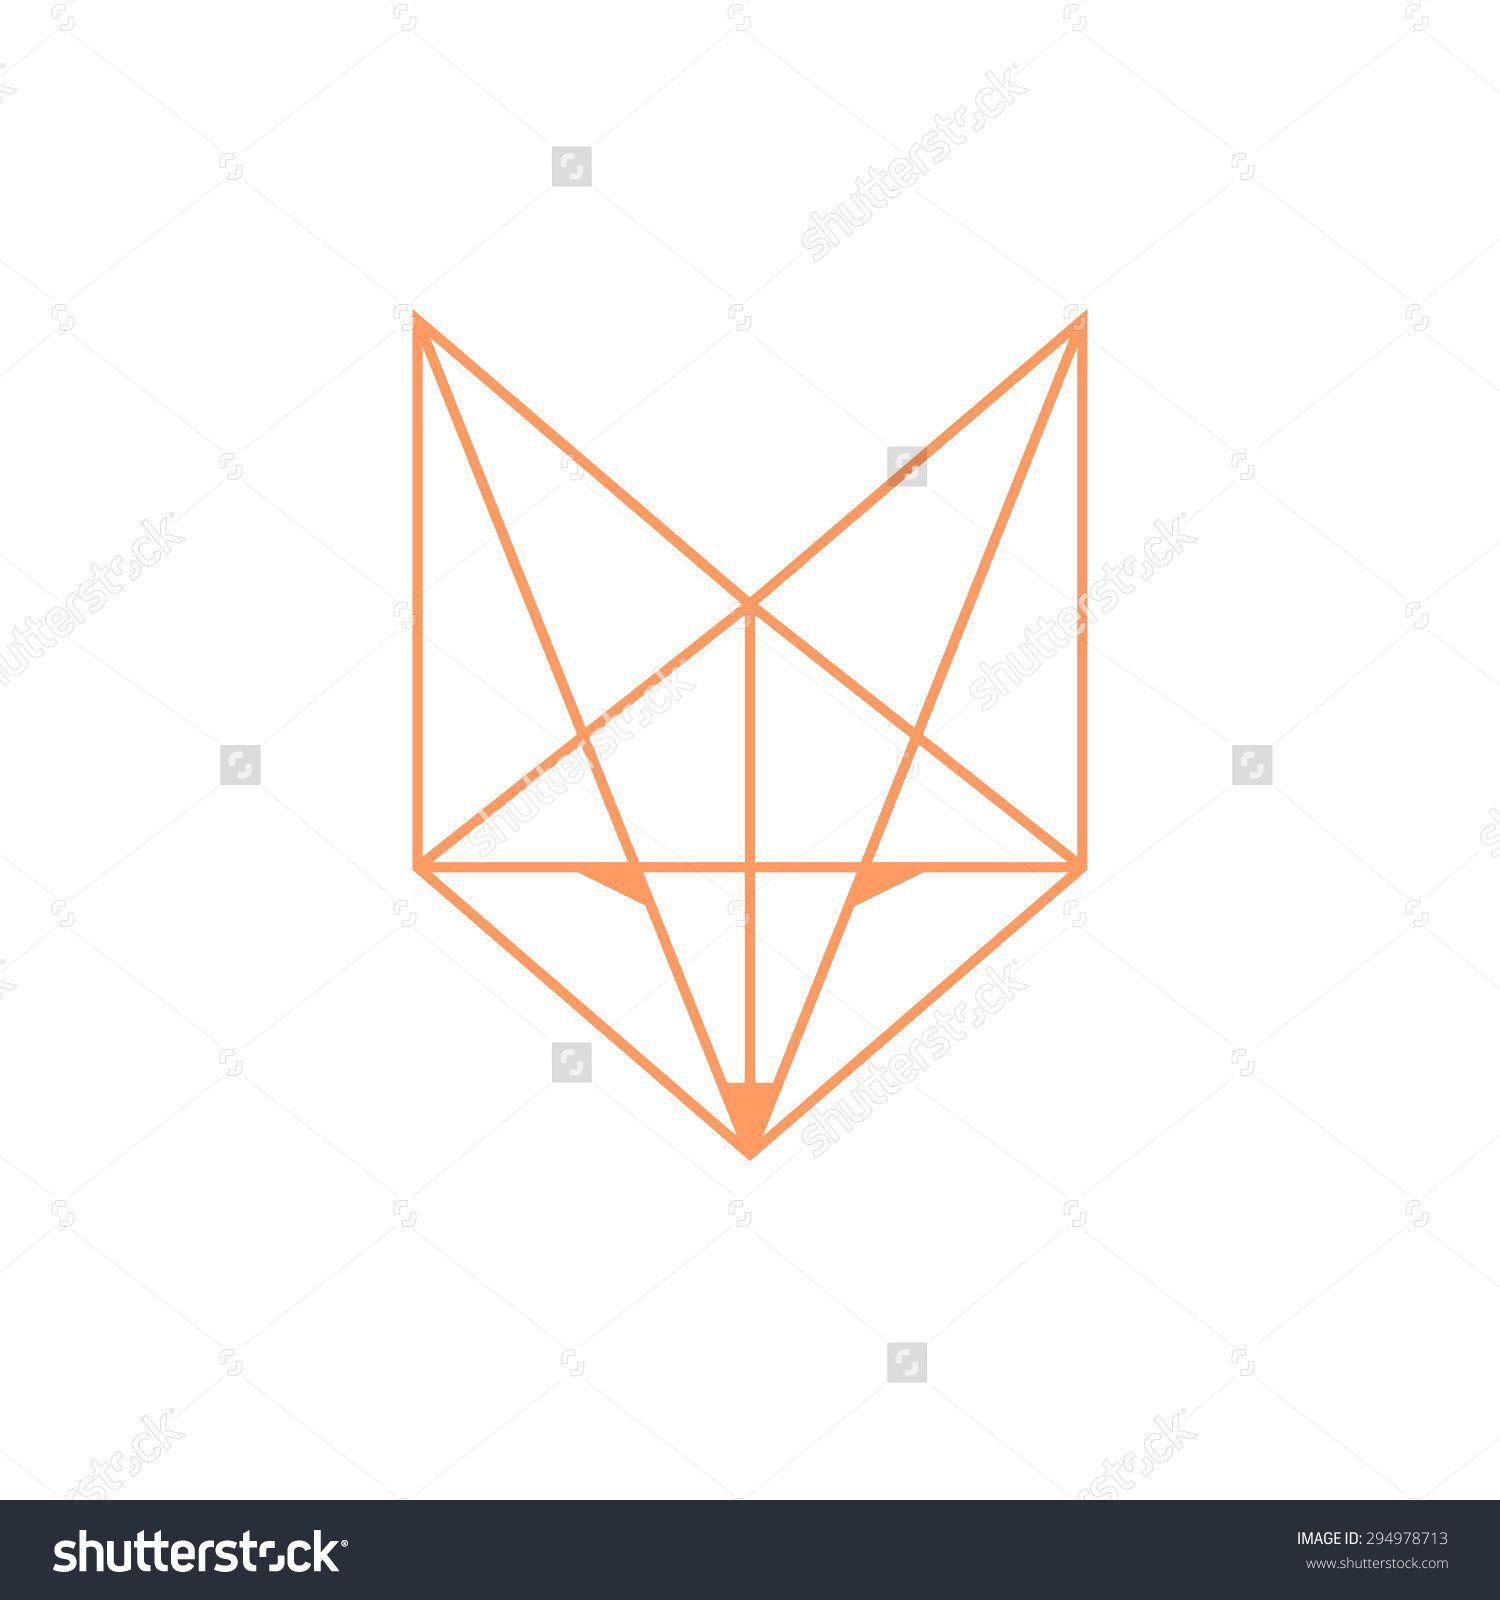 fox geometric - Google Search | Furries | Pinterest ... - photo#42